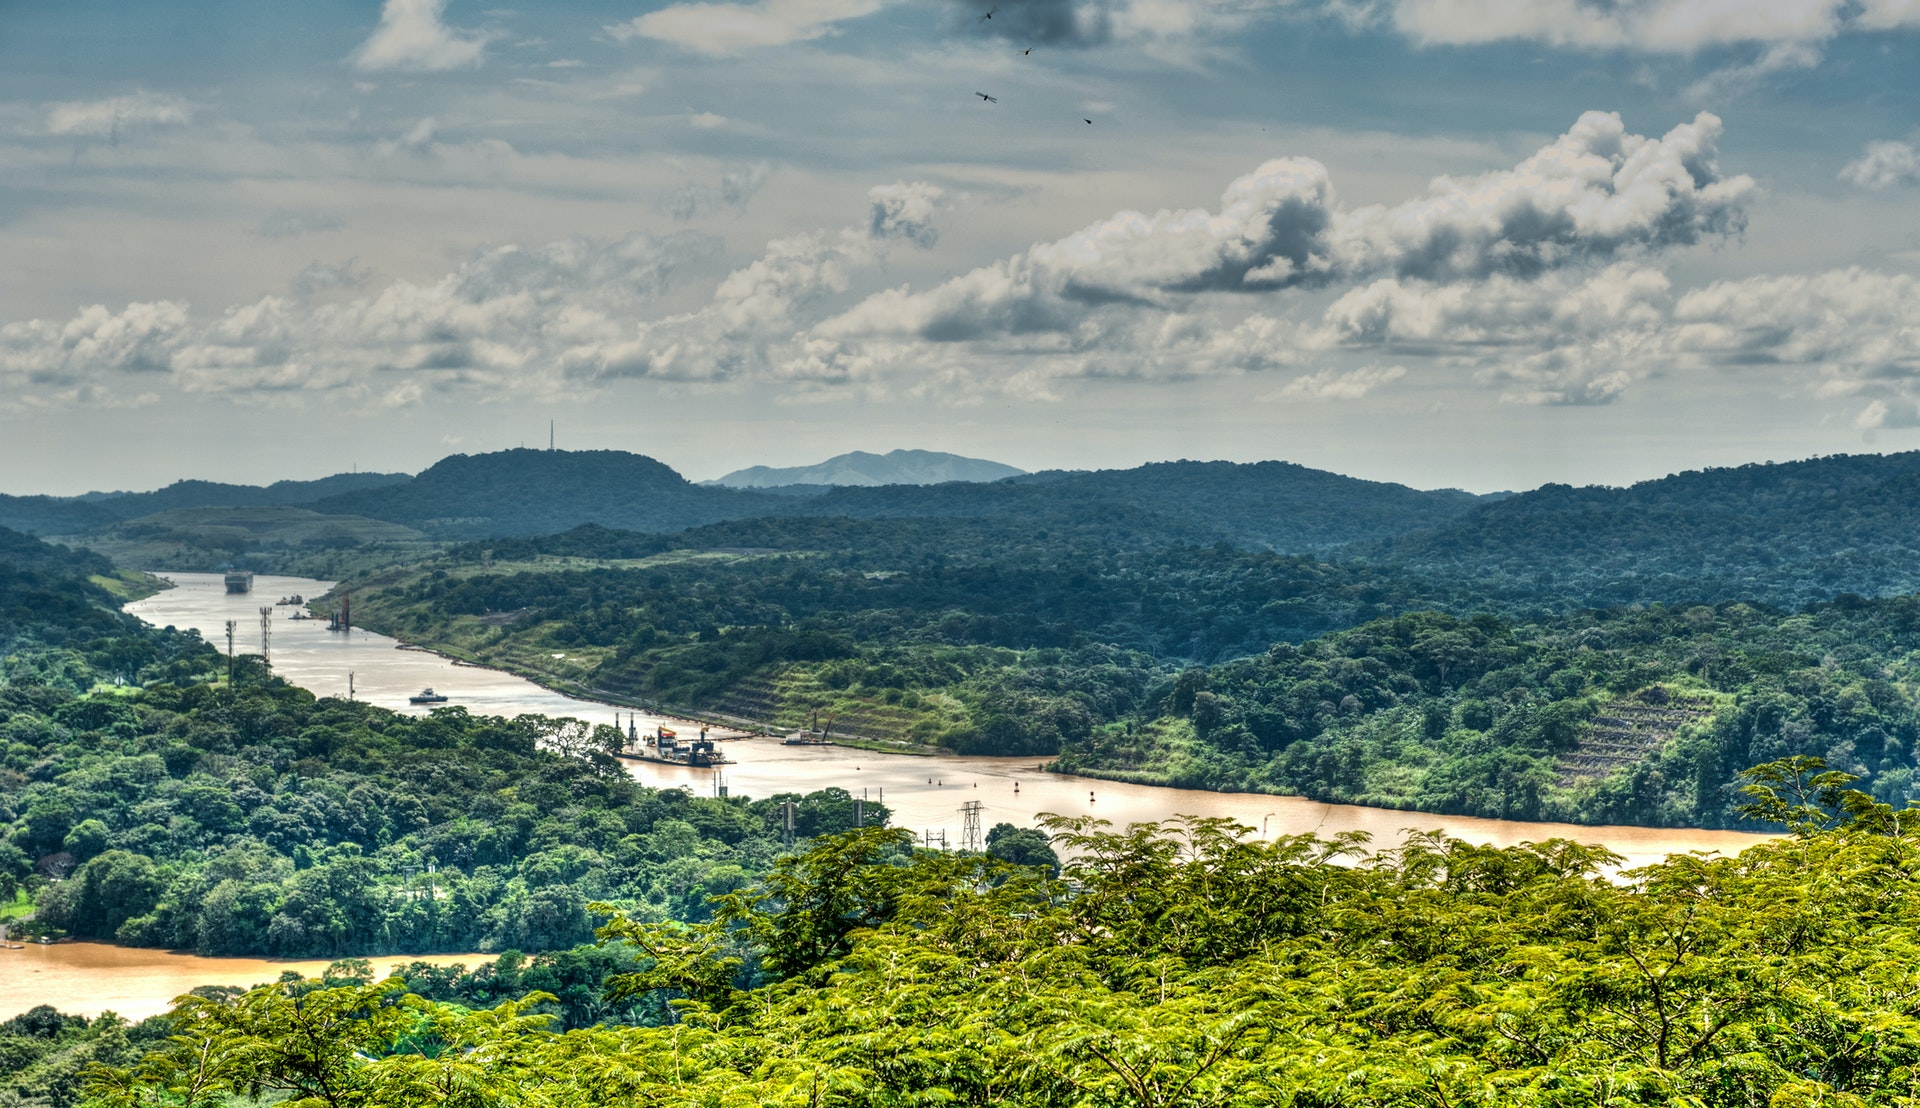 Panamakanalen © Dr. Jürgen Tenckhoff, Getty Images